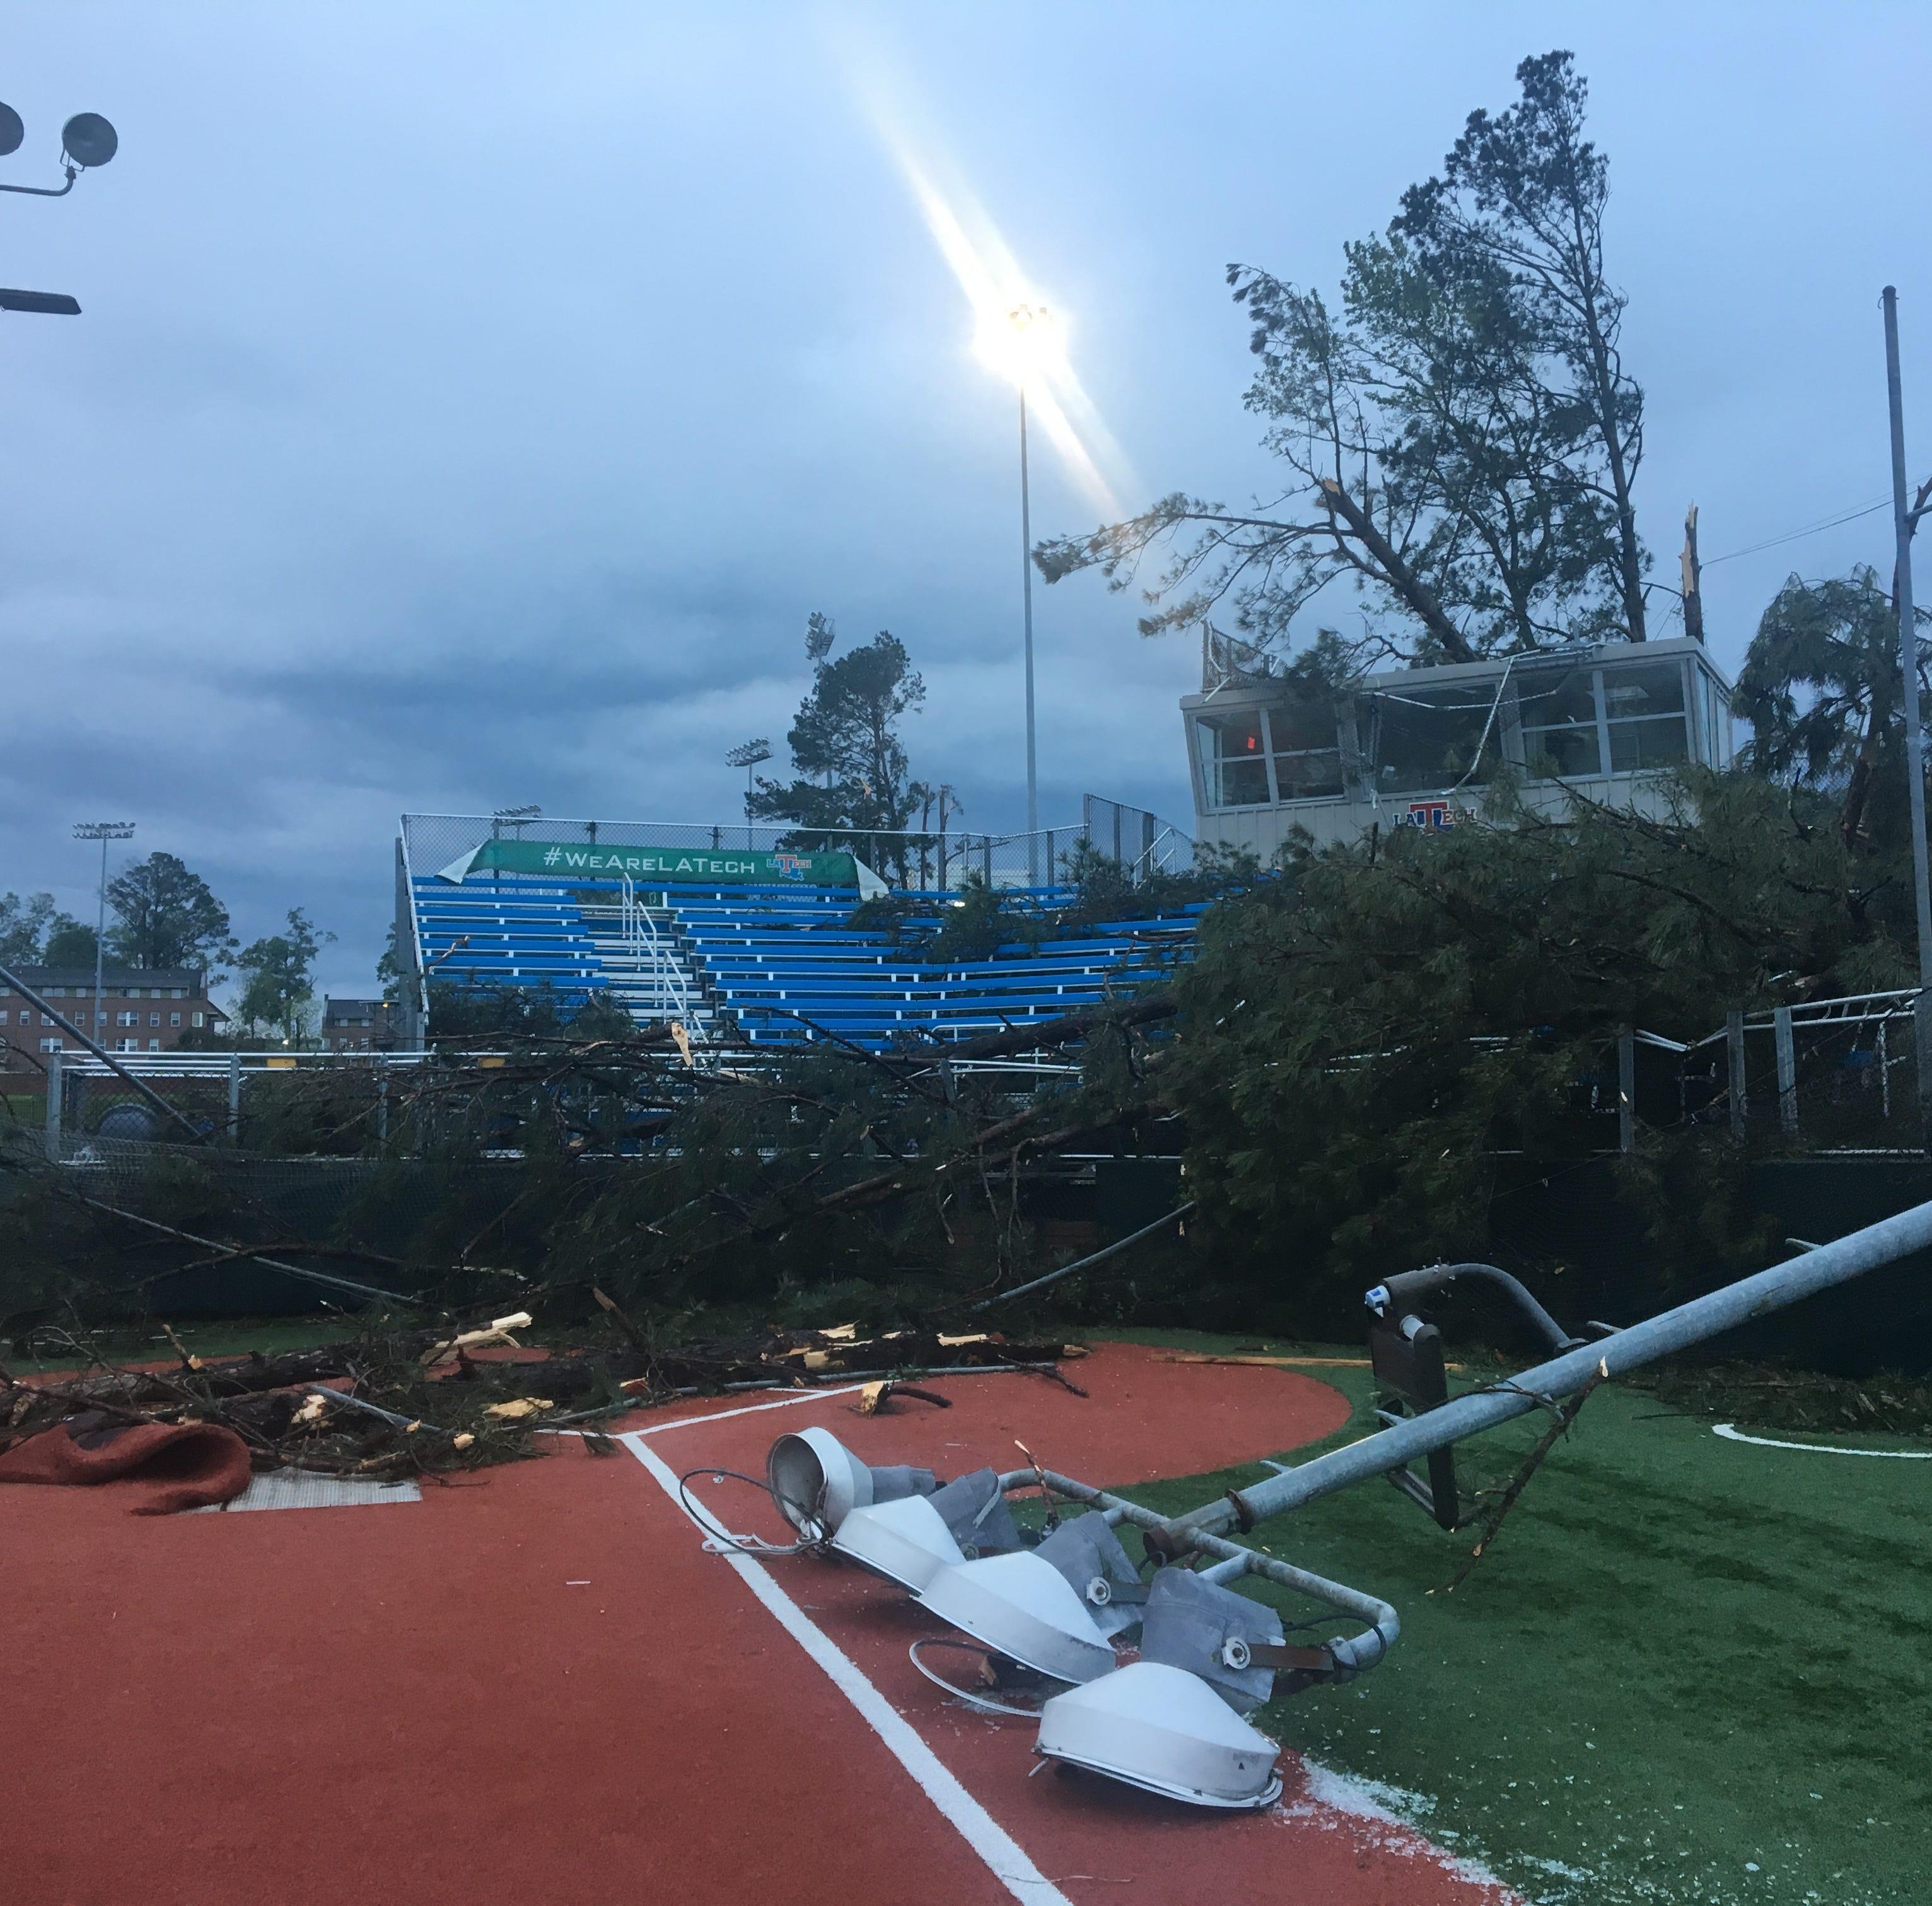 LA Tech sports facilities 'total rebuild' after 'devastating' early morning tornado